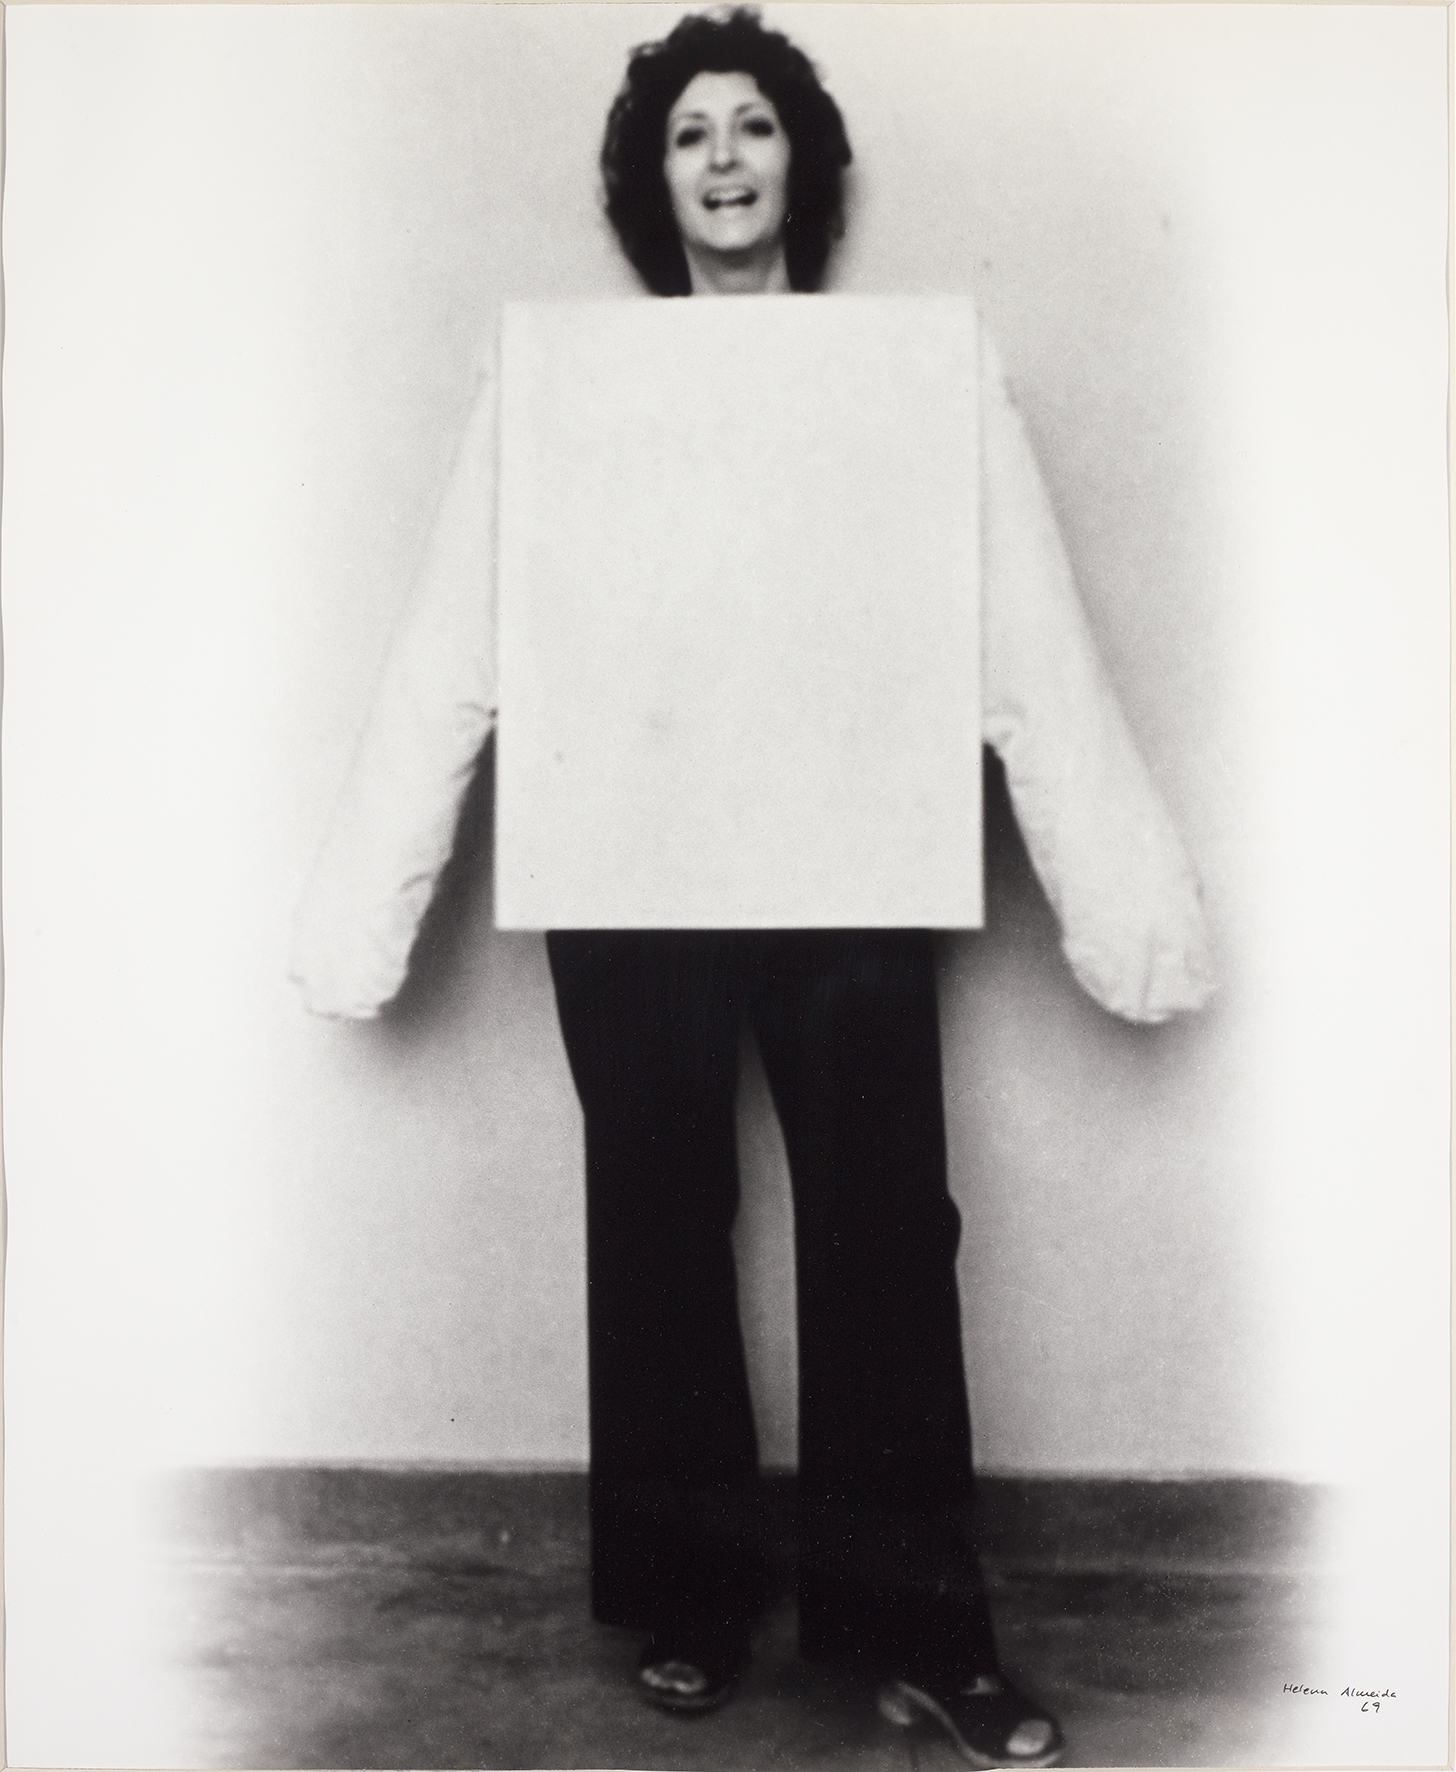 Helena Almeida, Tela rosa para vestir, 1969. Foto Filipe Braga